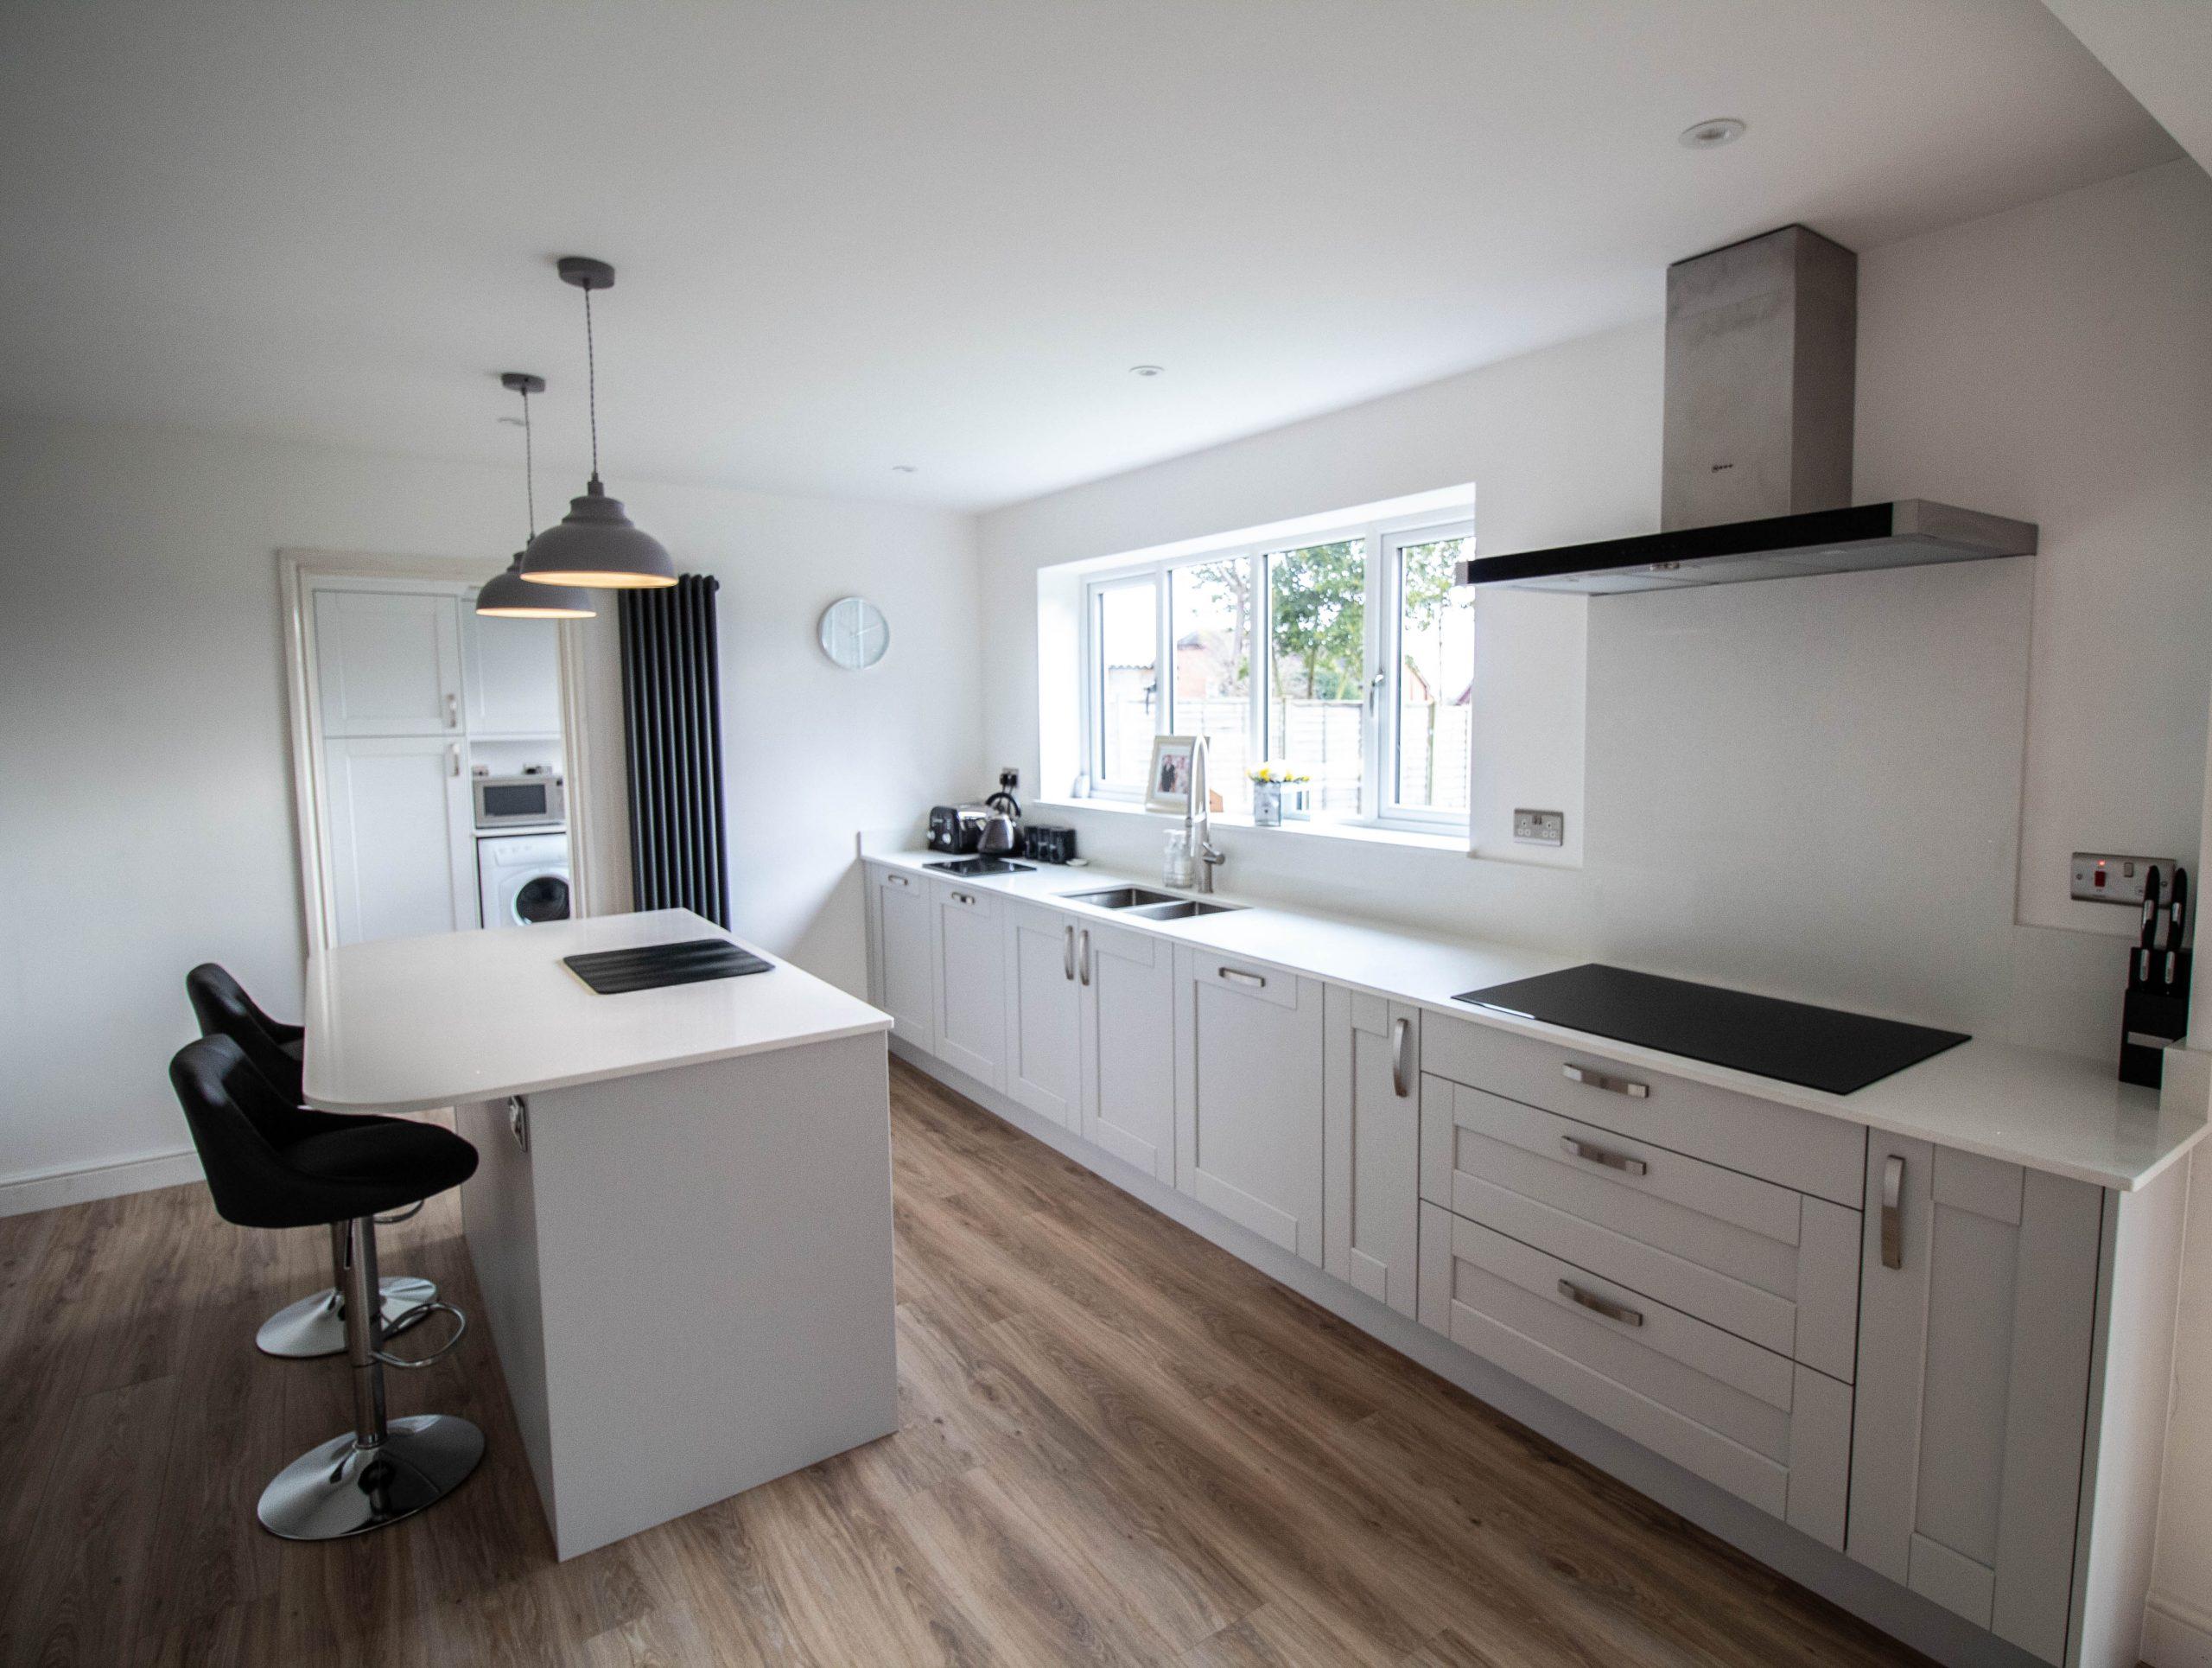 Kensington Shaker Kitchen in Light Grey, Noble Kitchens